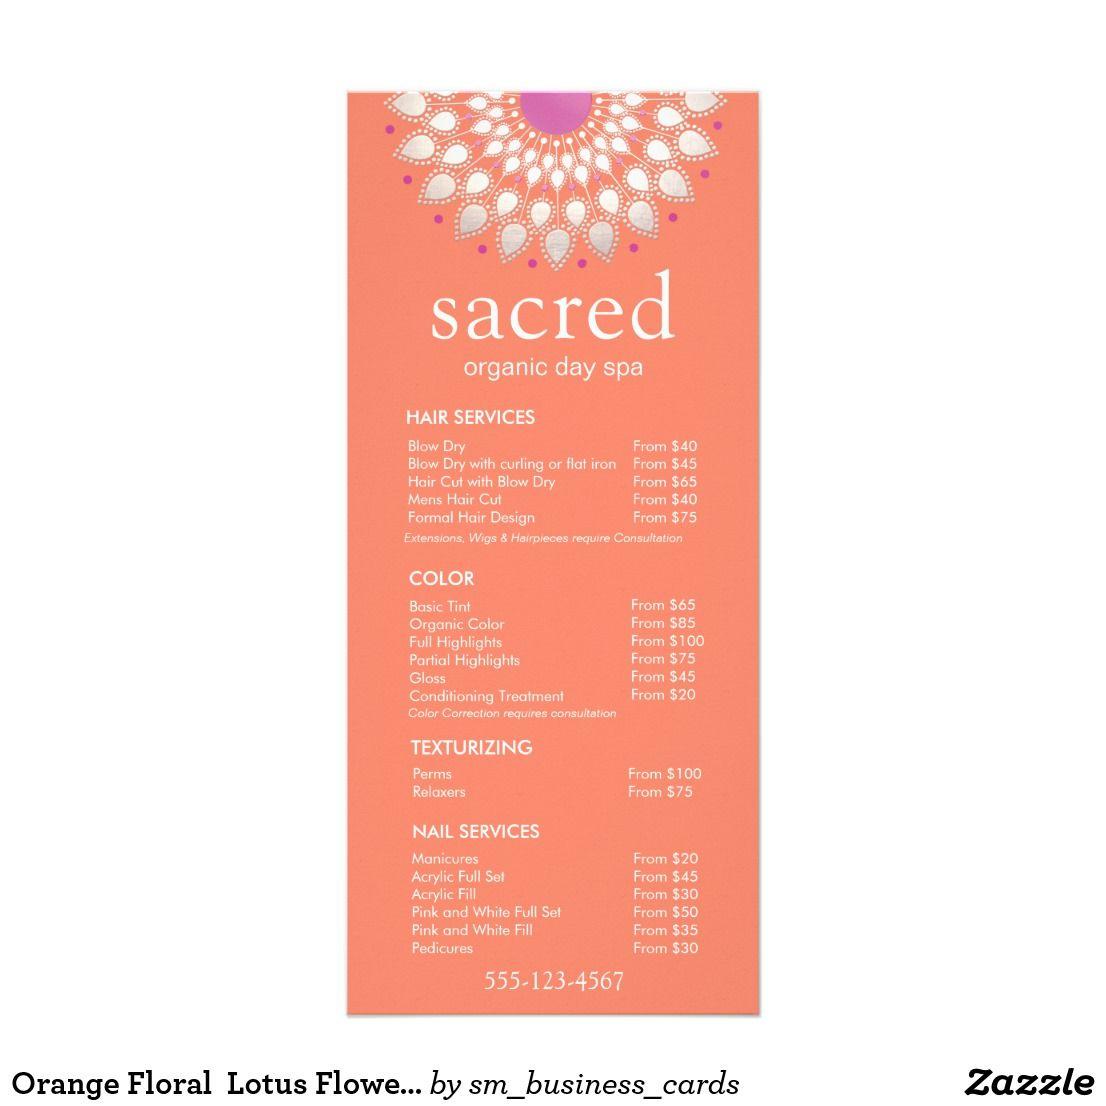 Orange floral lotus flower spa salon list menu lotus flower orange floral lotus flower spa salon list menu izmirmasajfo Gallery